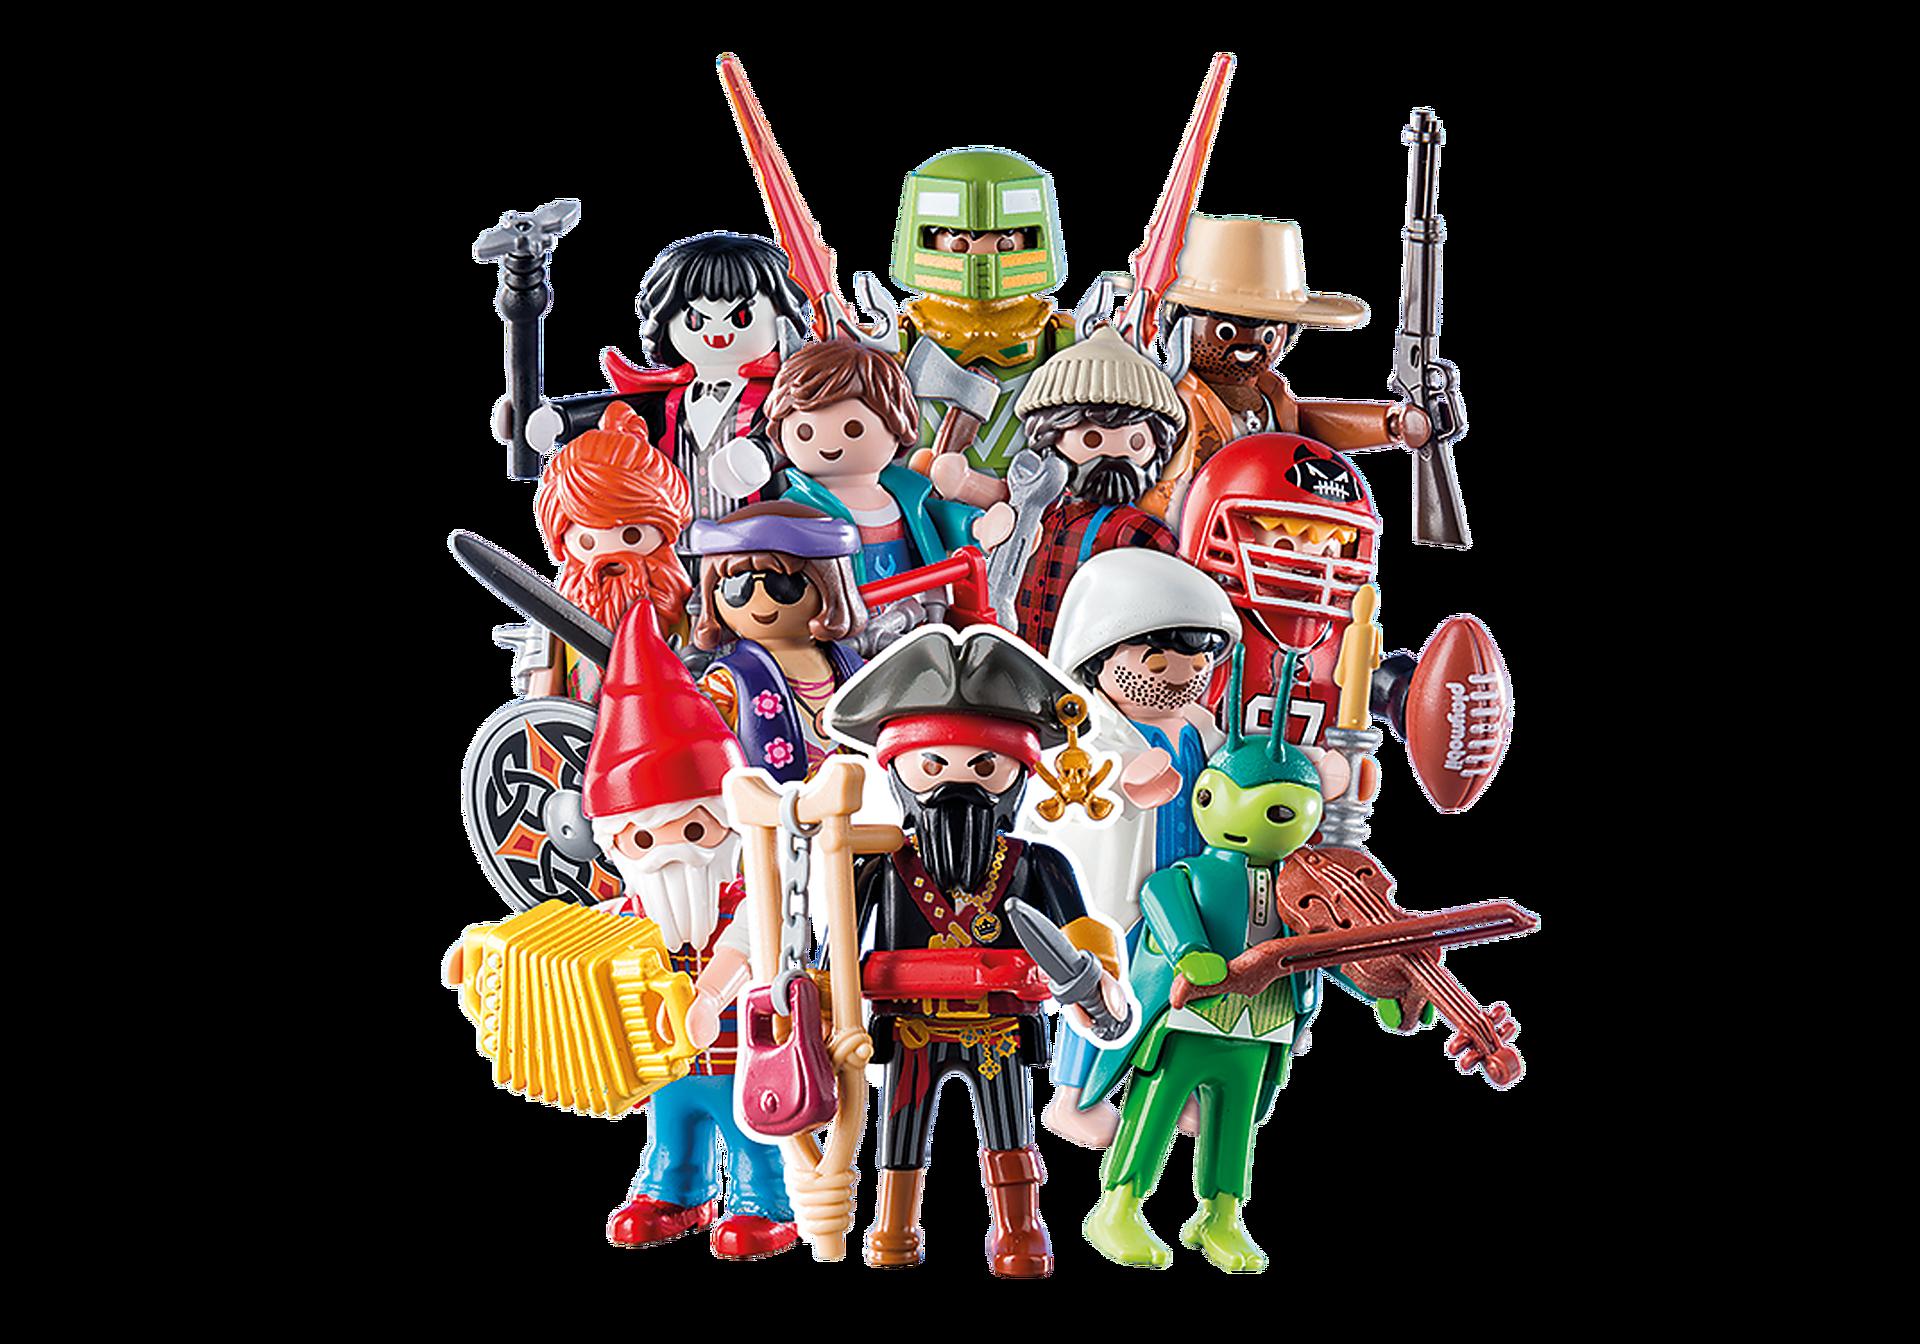 70025 PLAYMOBIL Figures Series 15 - Boys zoom image1